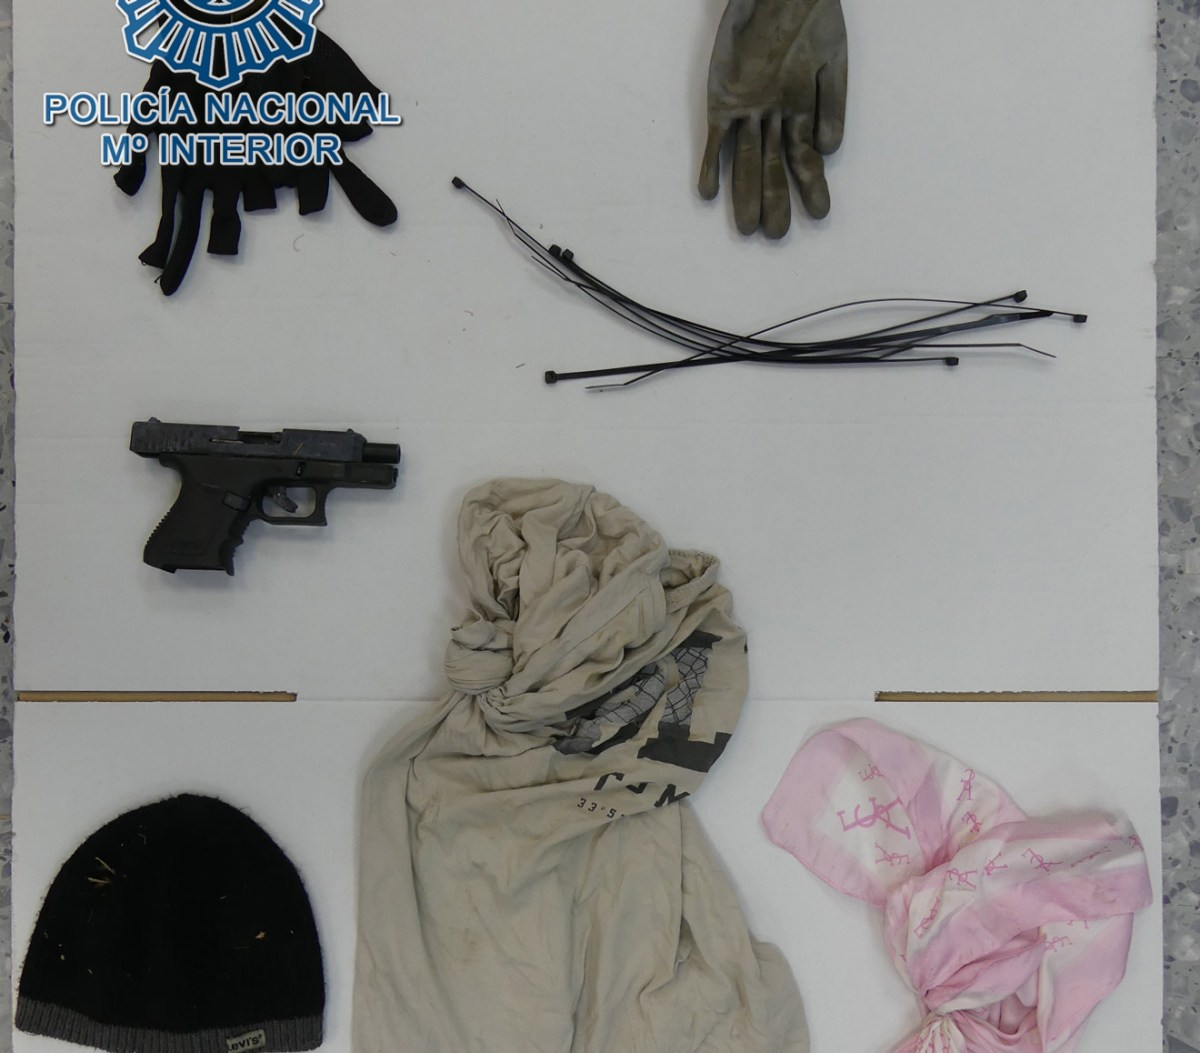 Enseres incautados a los asaltantes /Policía Nacional